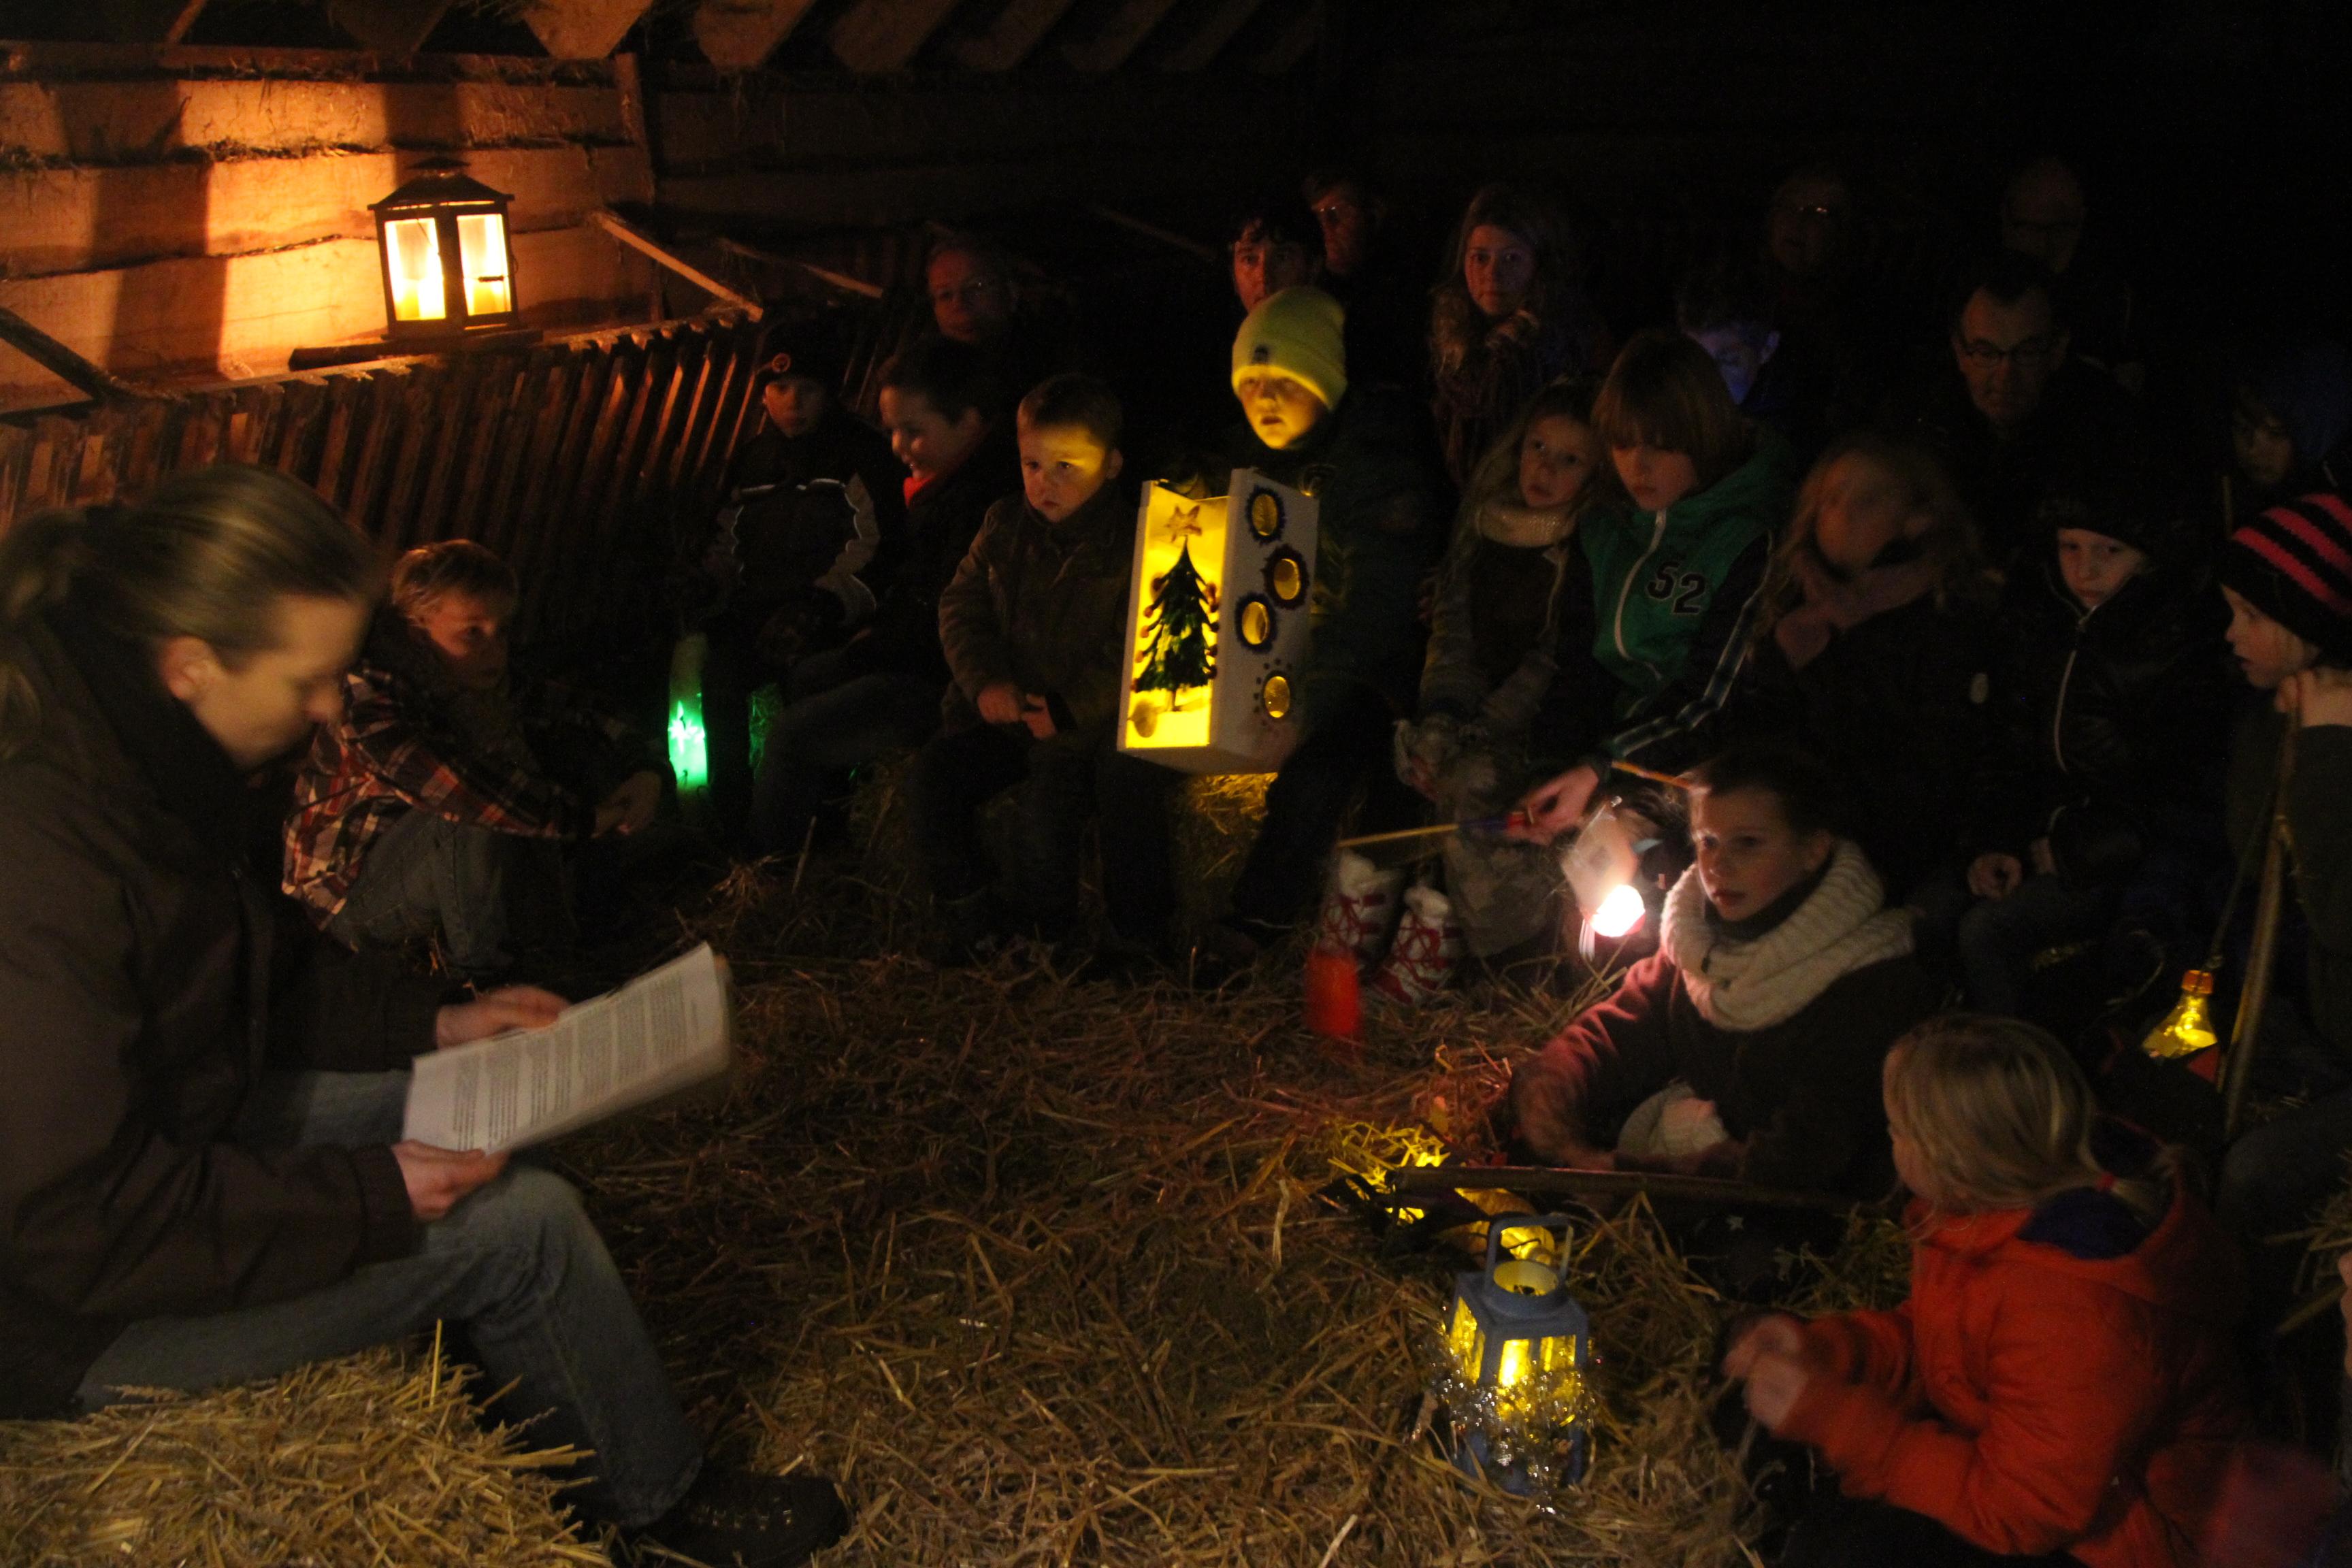 Lampionnetjes én kinderen stralen in de schaapskooi op midwinteravond